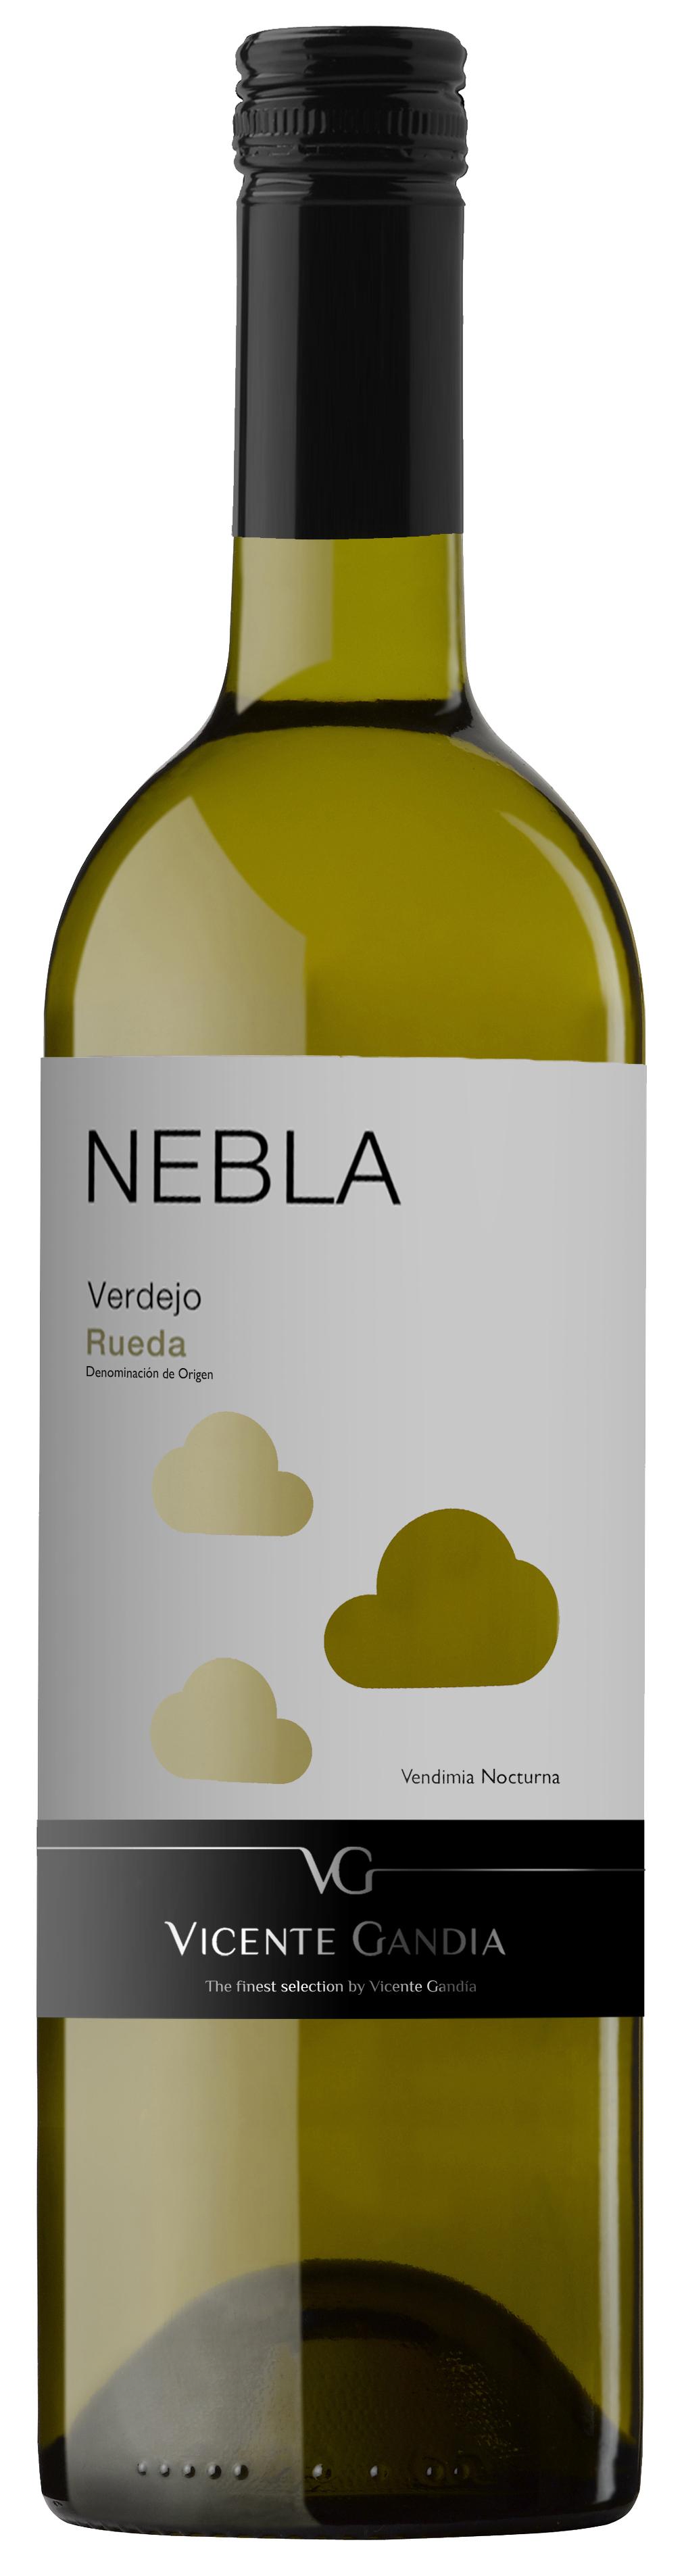 Vicente Gandia Nebla, Verdejo